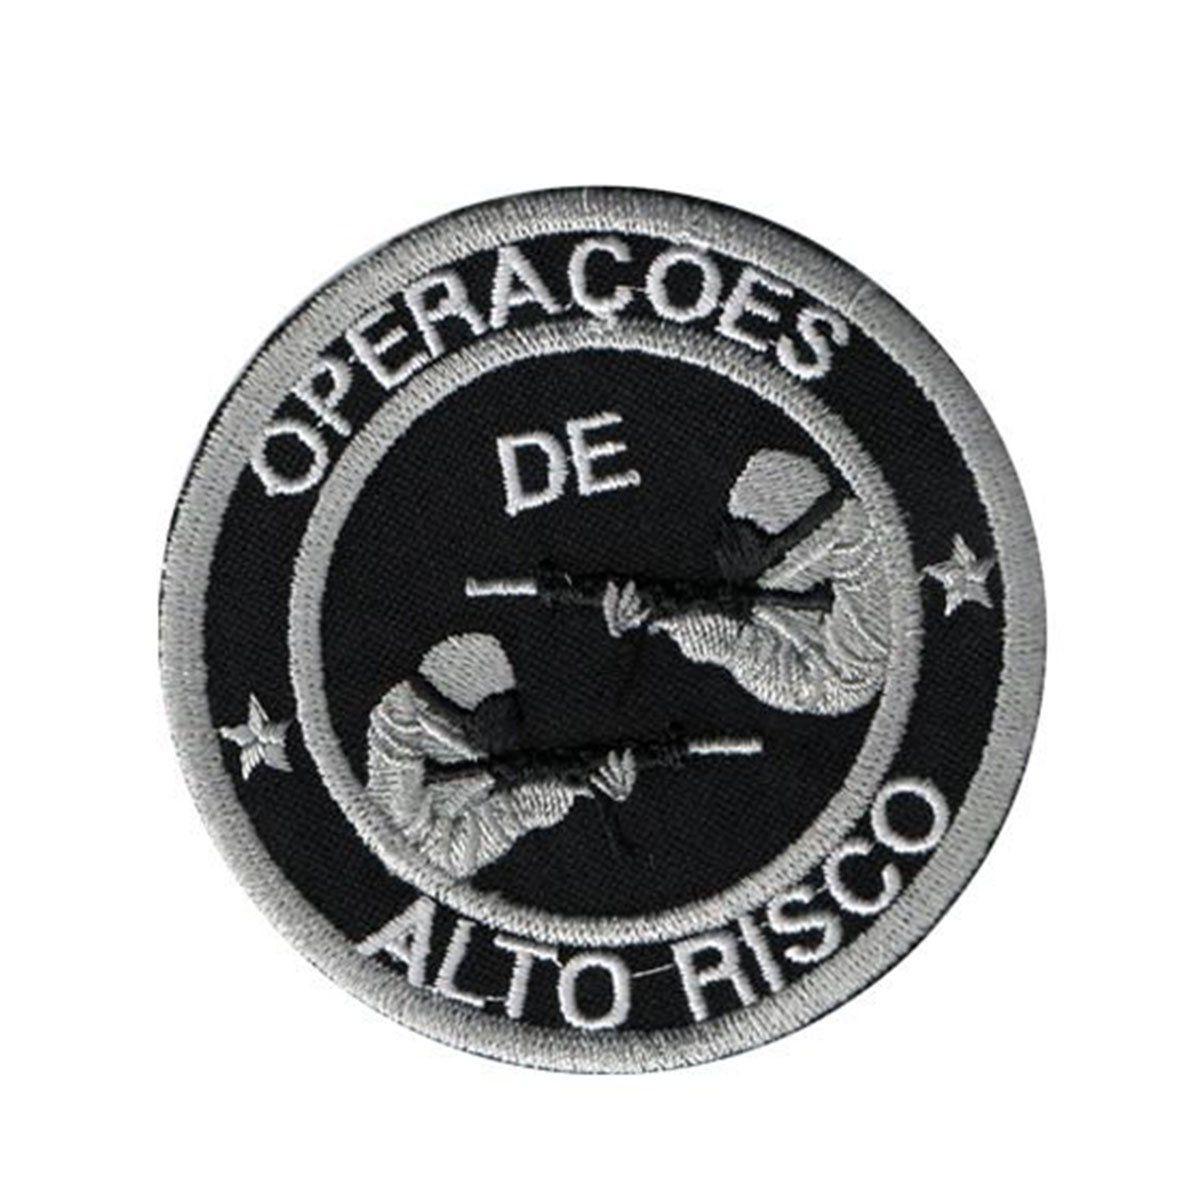 Bordado Termocolante Operacoes de Alto Risco